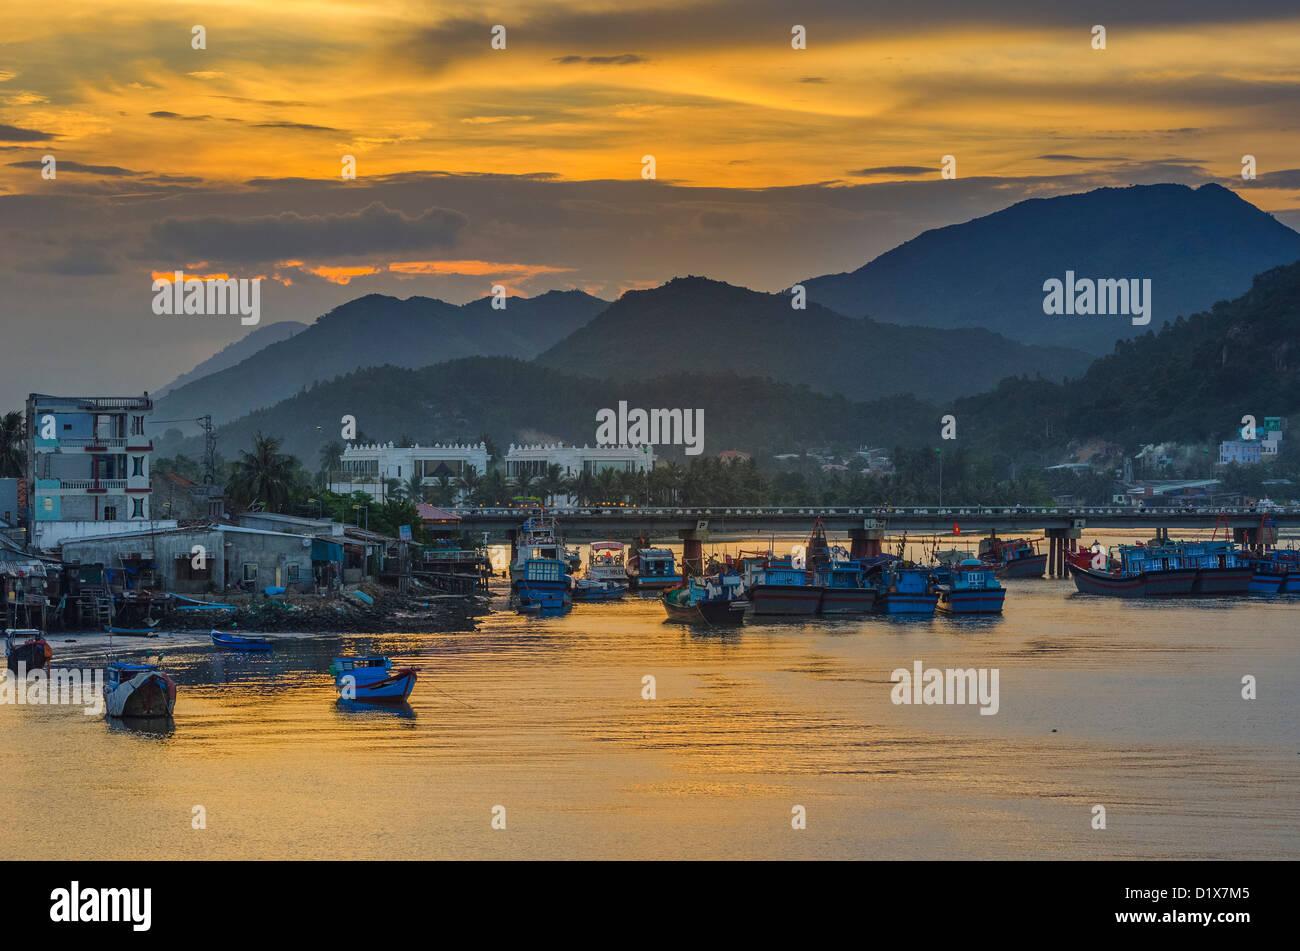 Fishing Boats in Nha Trang Harbor, Vietnam Stock Photo